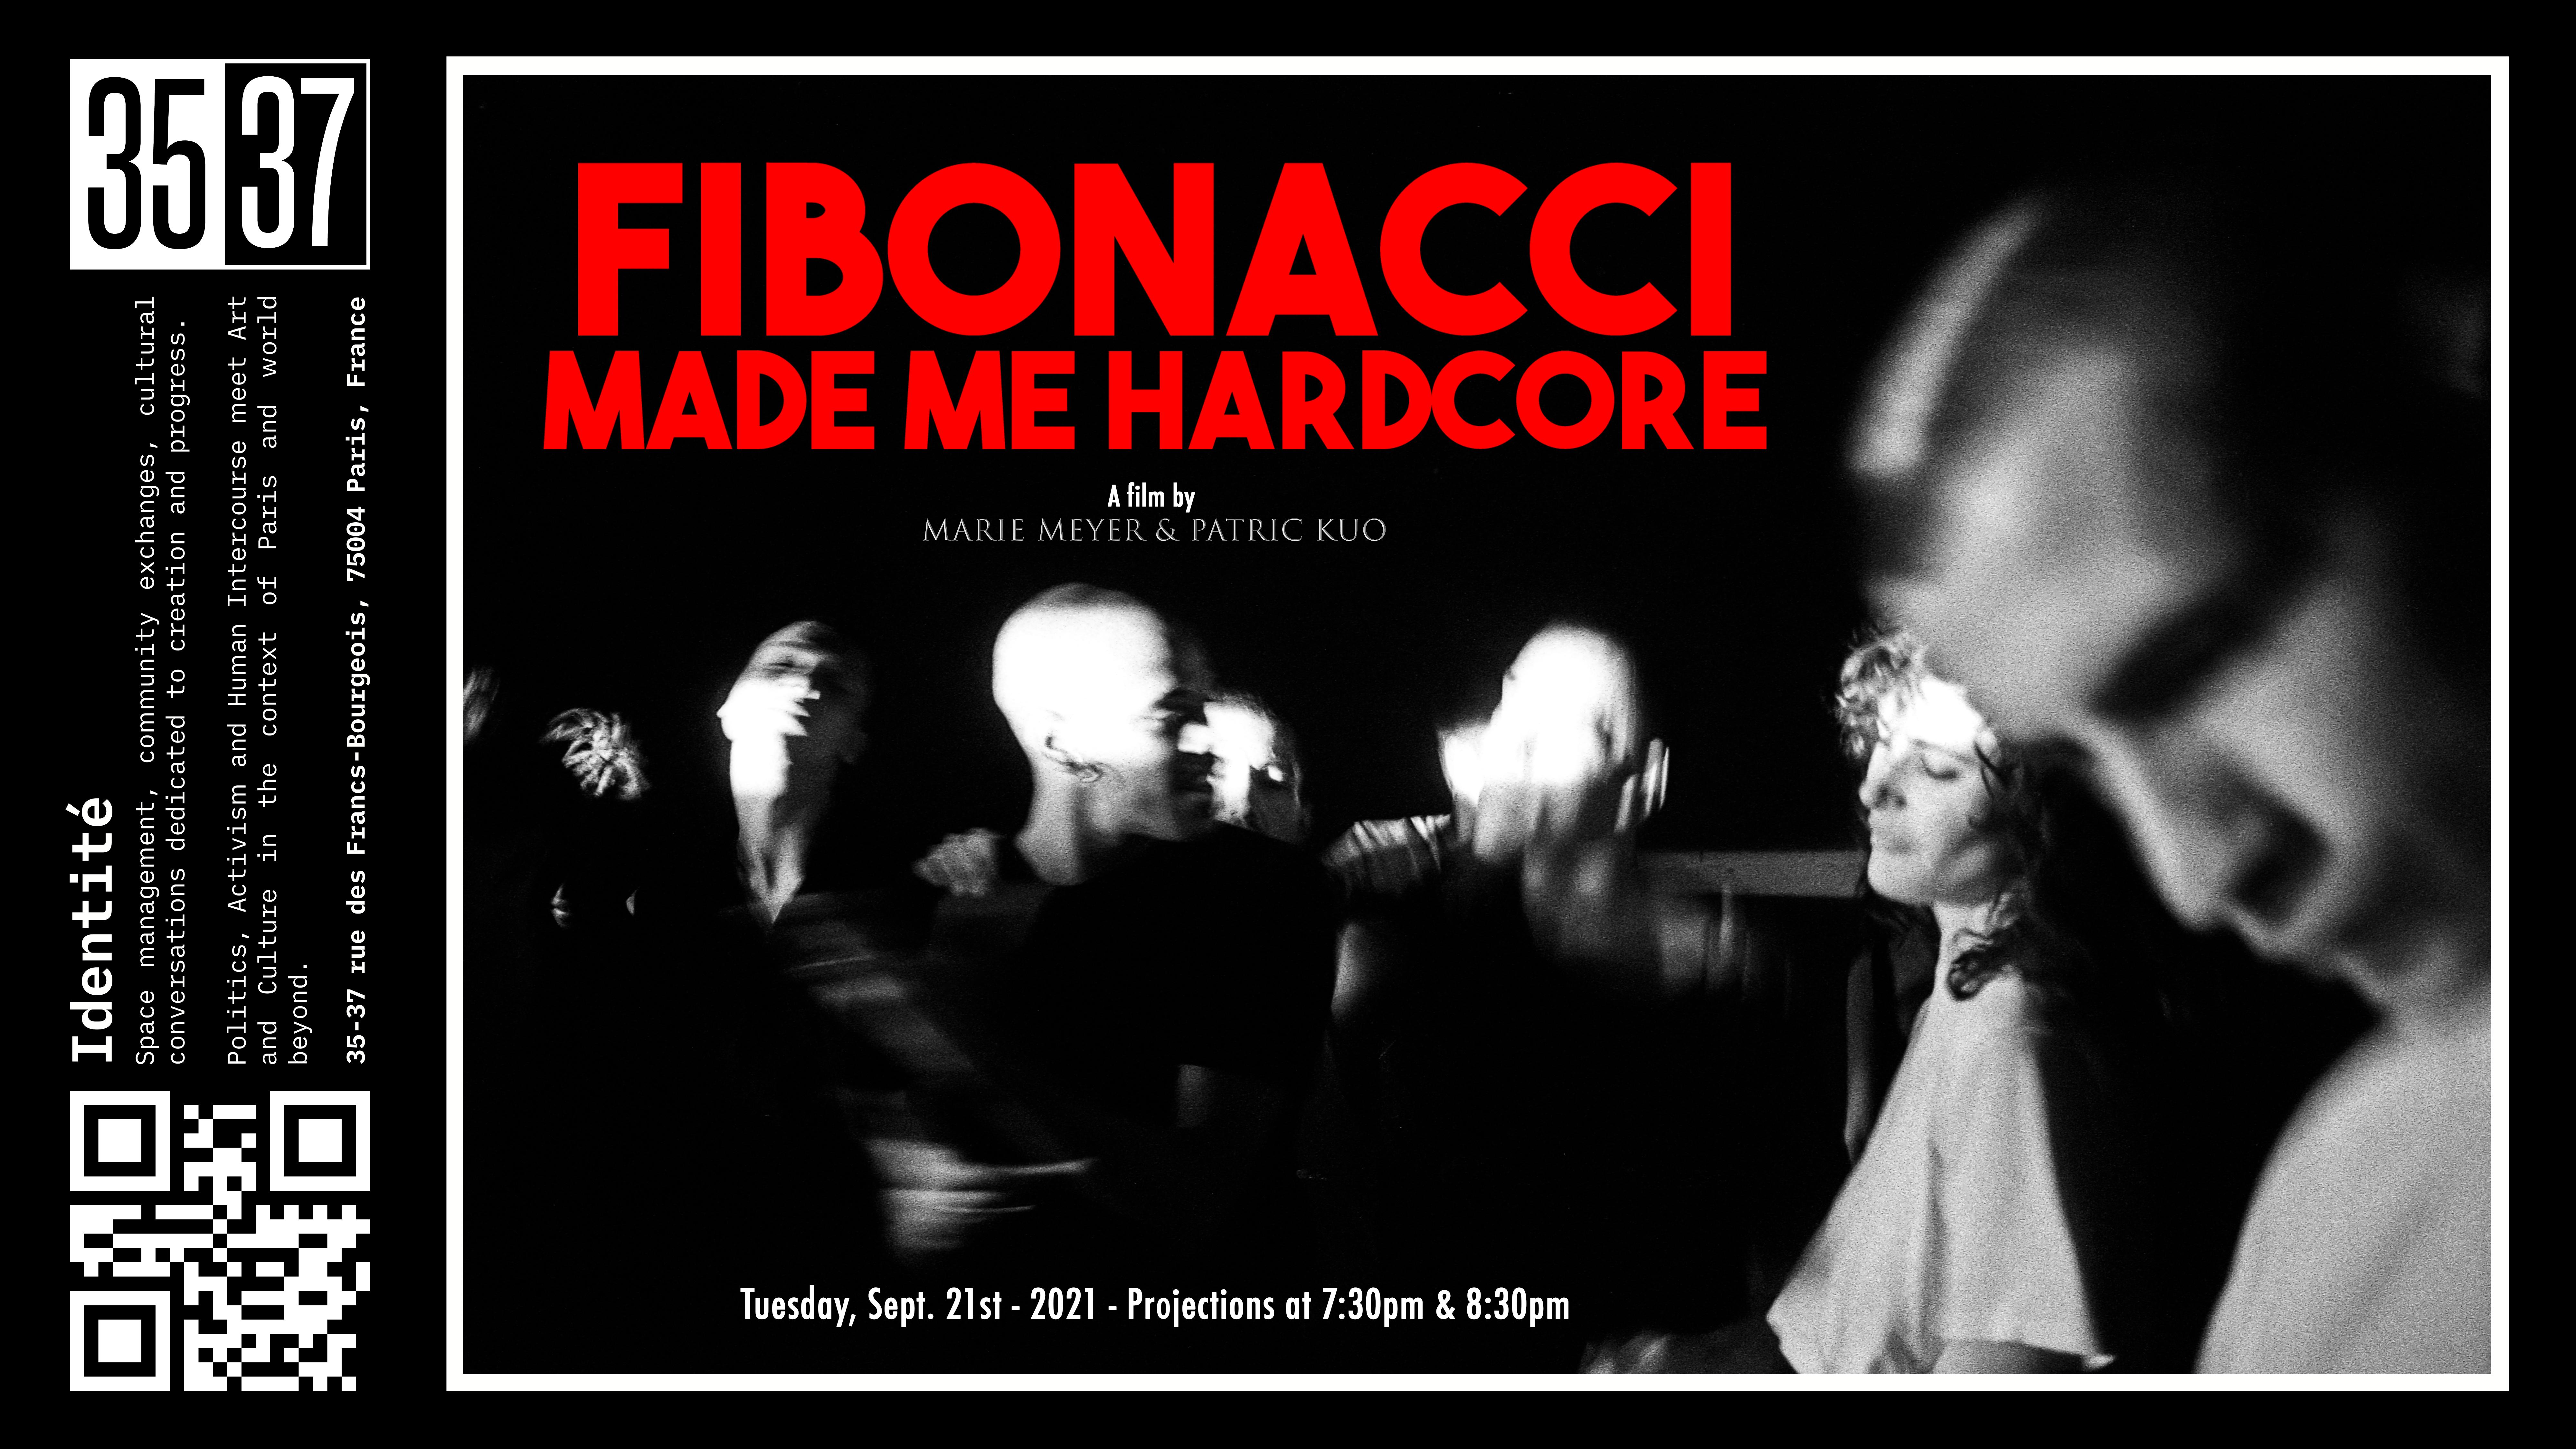 FIBONACCI MADE ME HARDCORE @ 3537